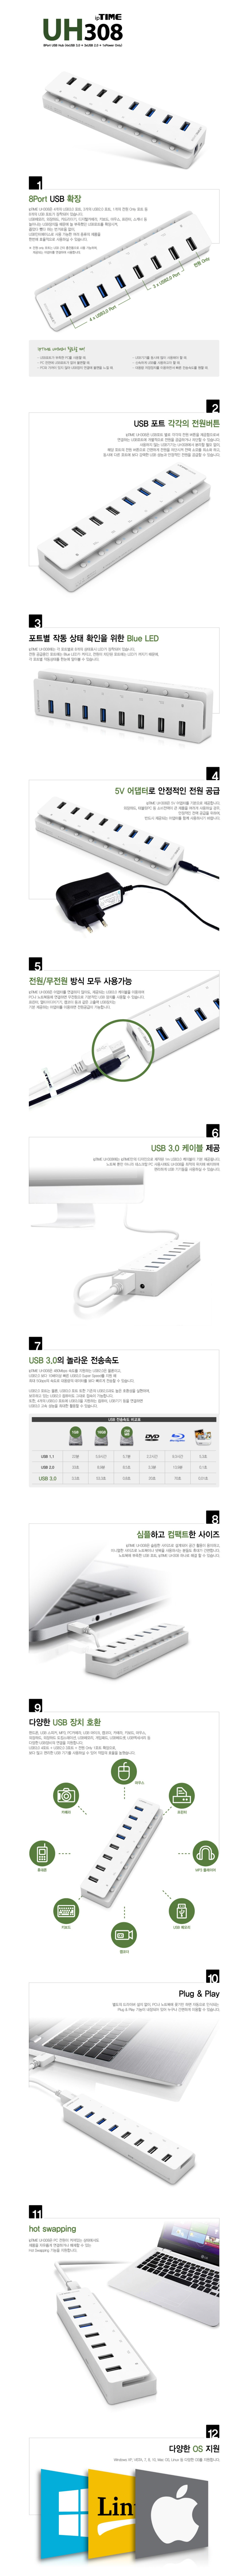 Screenshot_2020-03-20 [다나와] EFM ipTIME UH308 (8포트 USB3 0 유전원).jpg